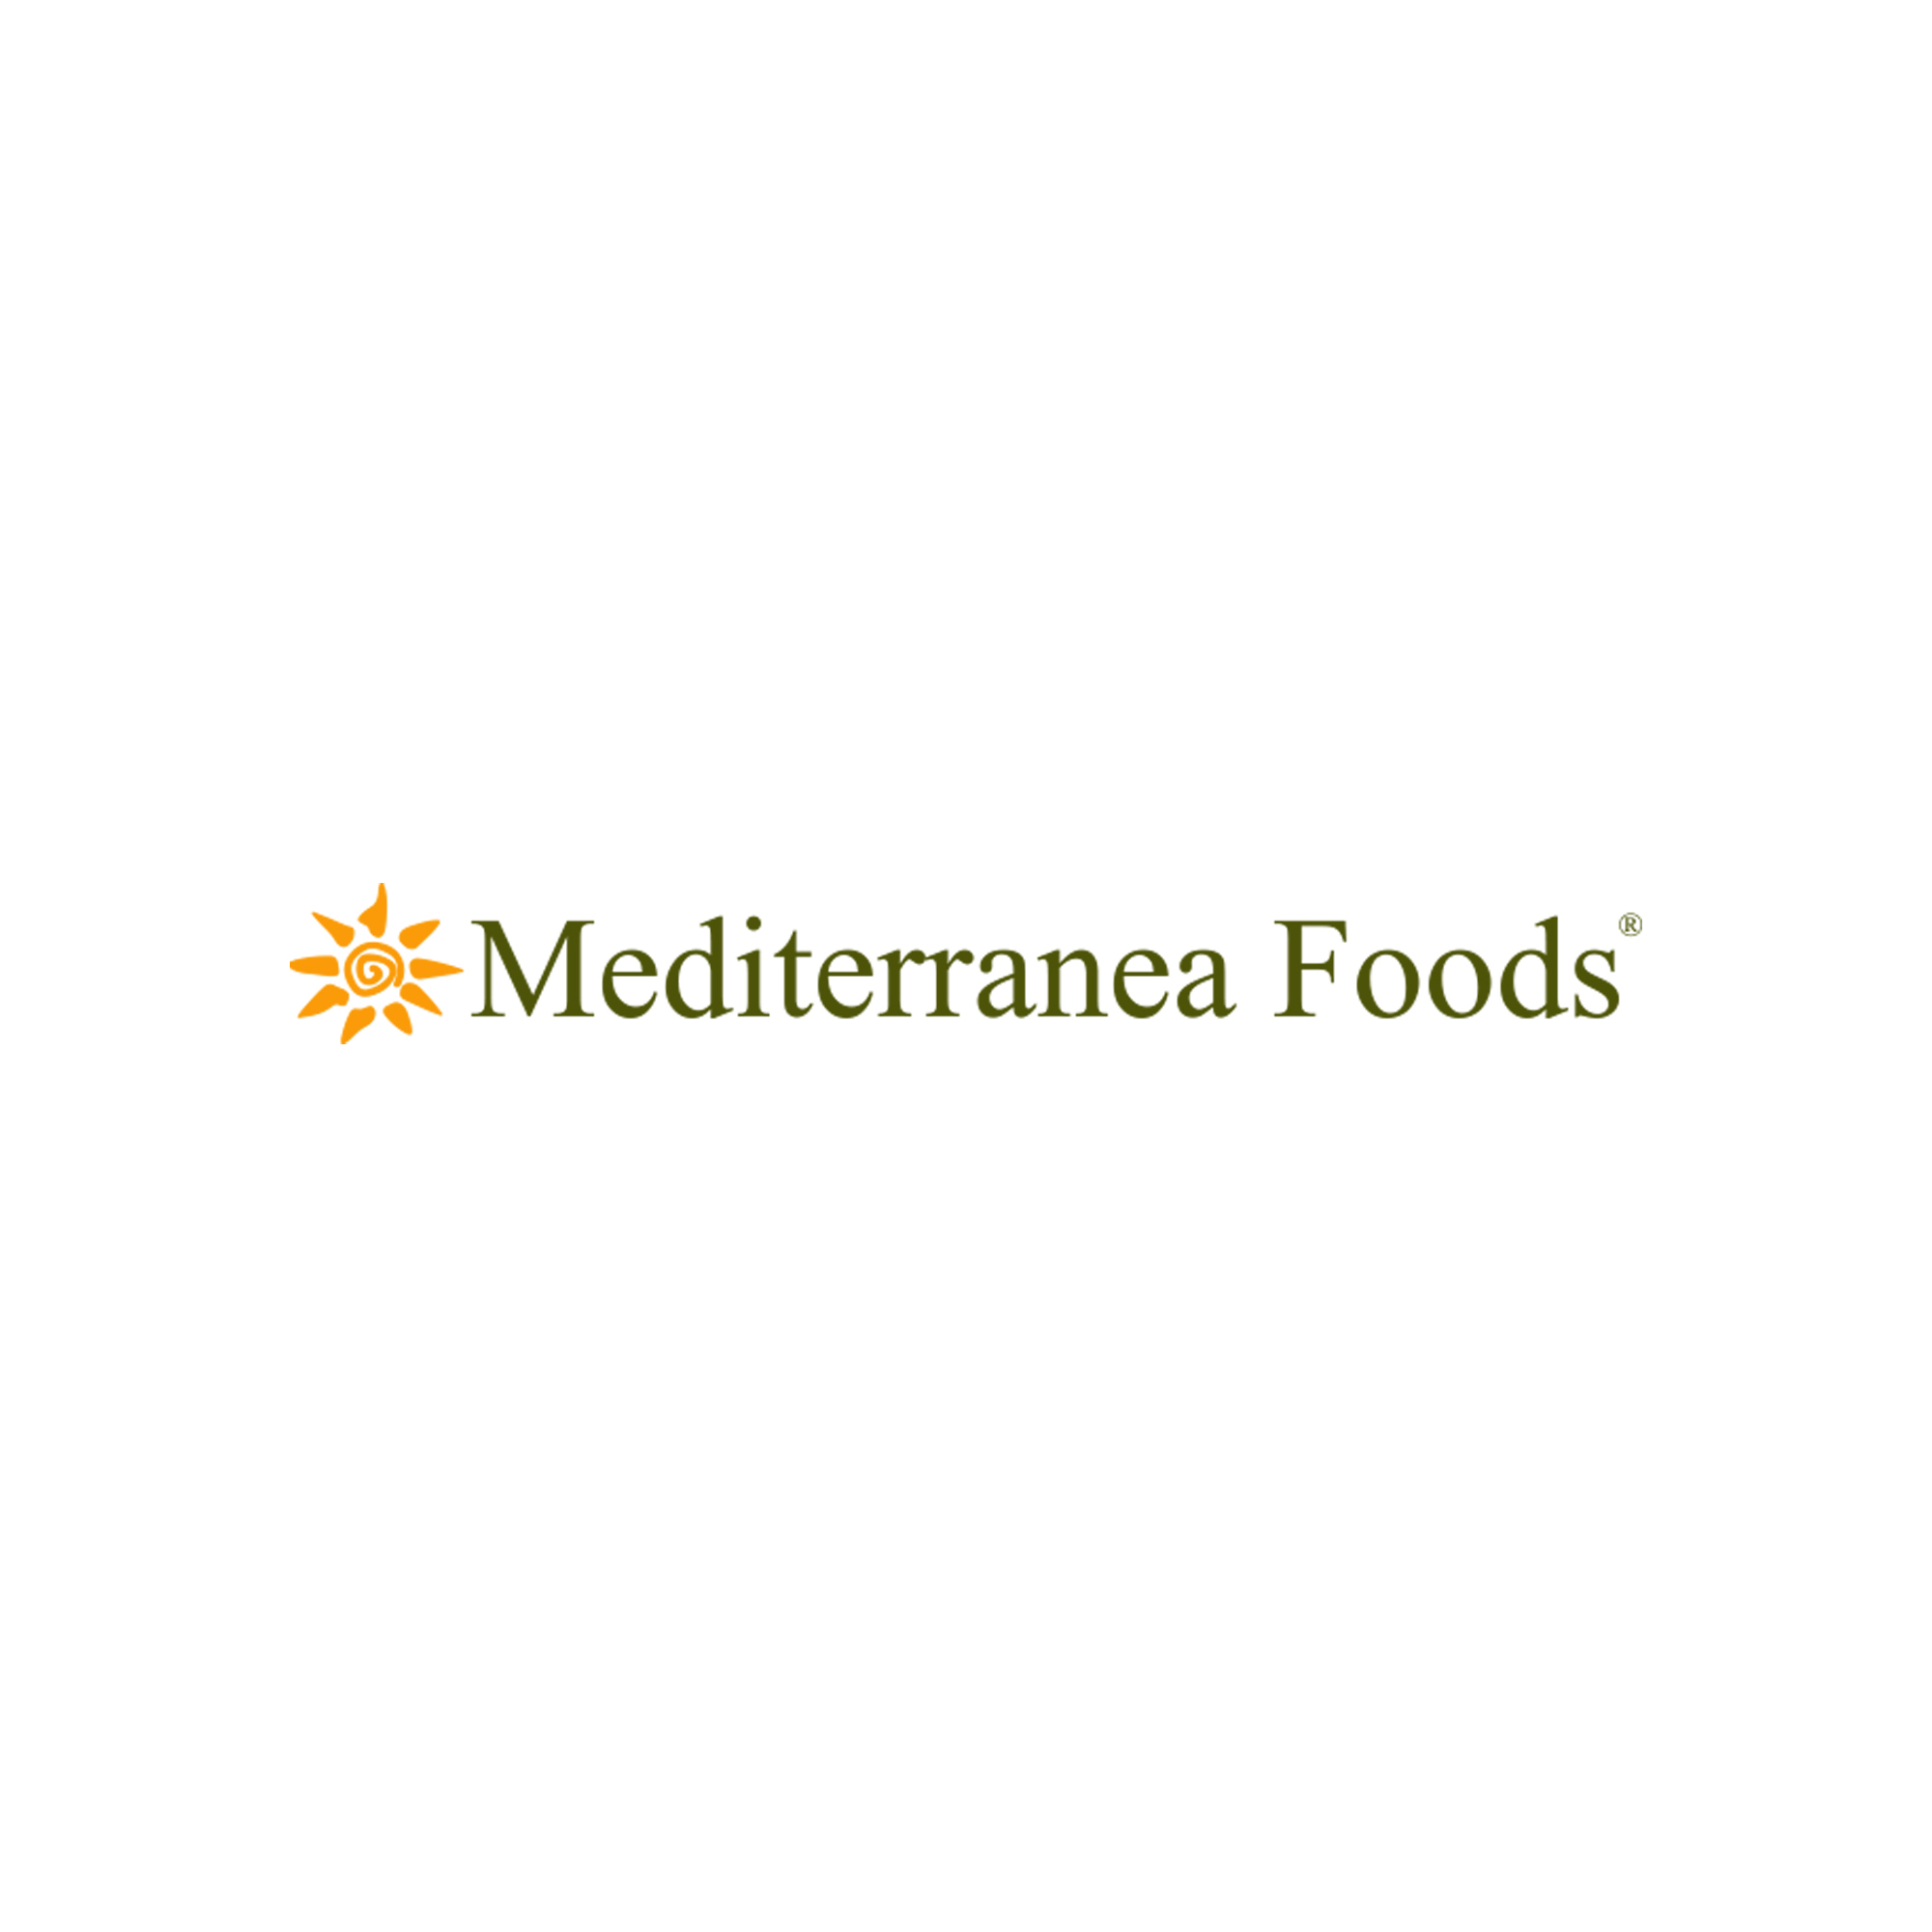 mediterranea logga.jpg